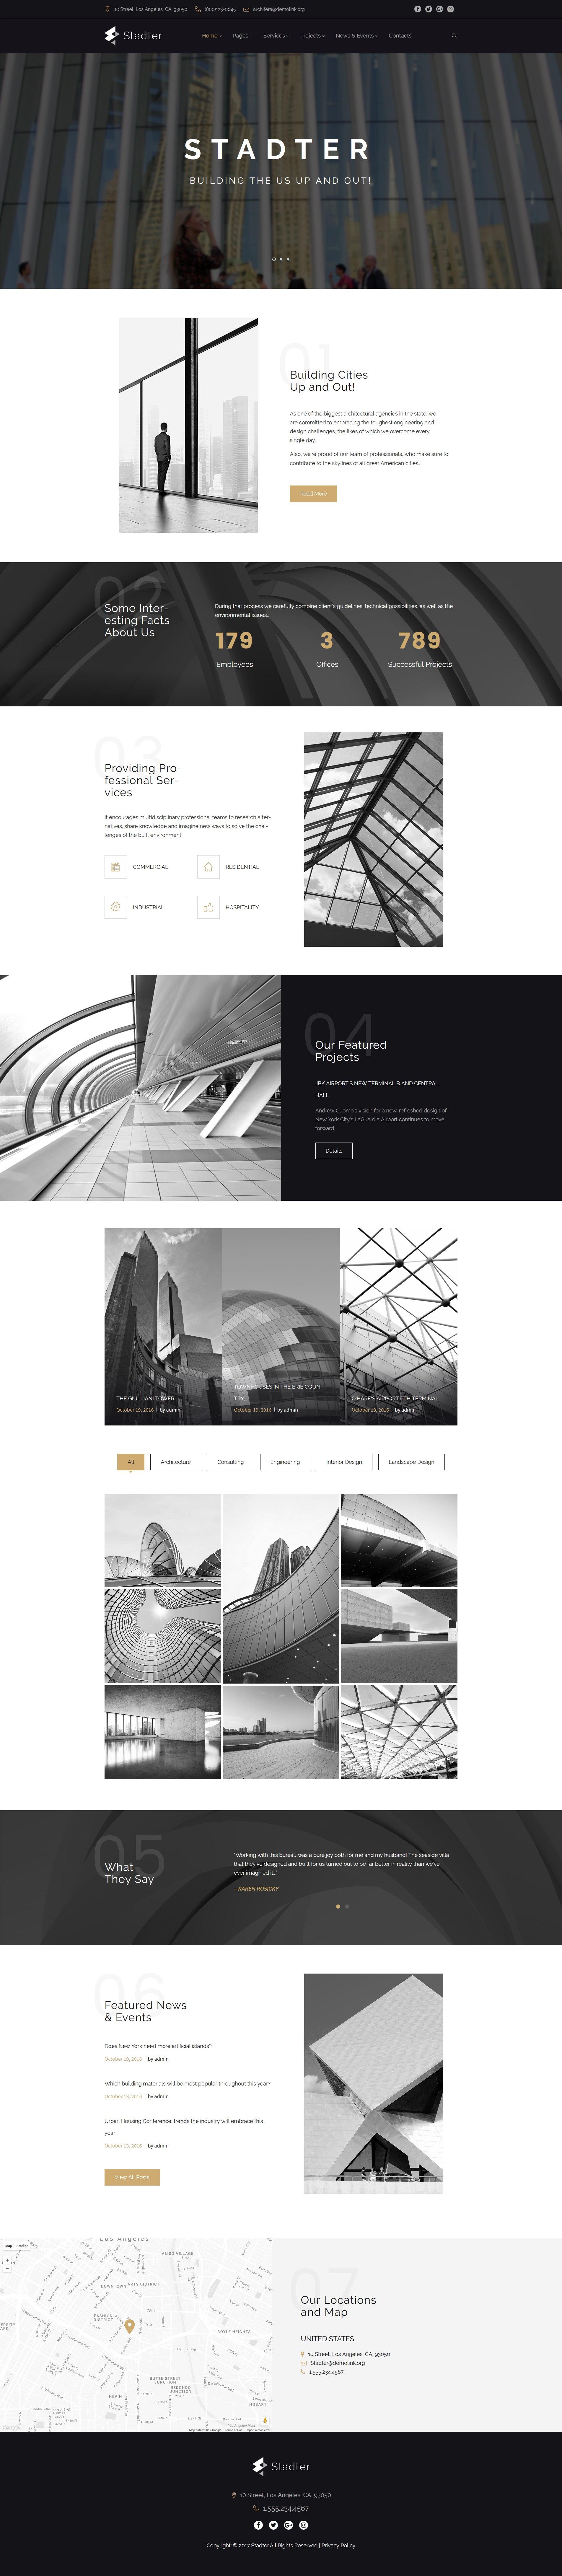 Stadter - Construction Company №63956 - скриншот